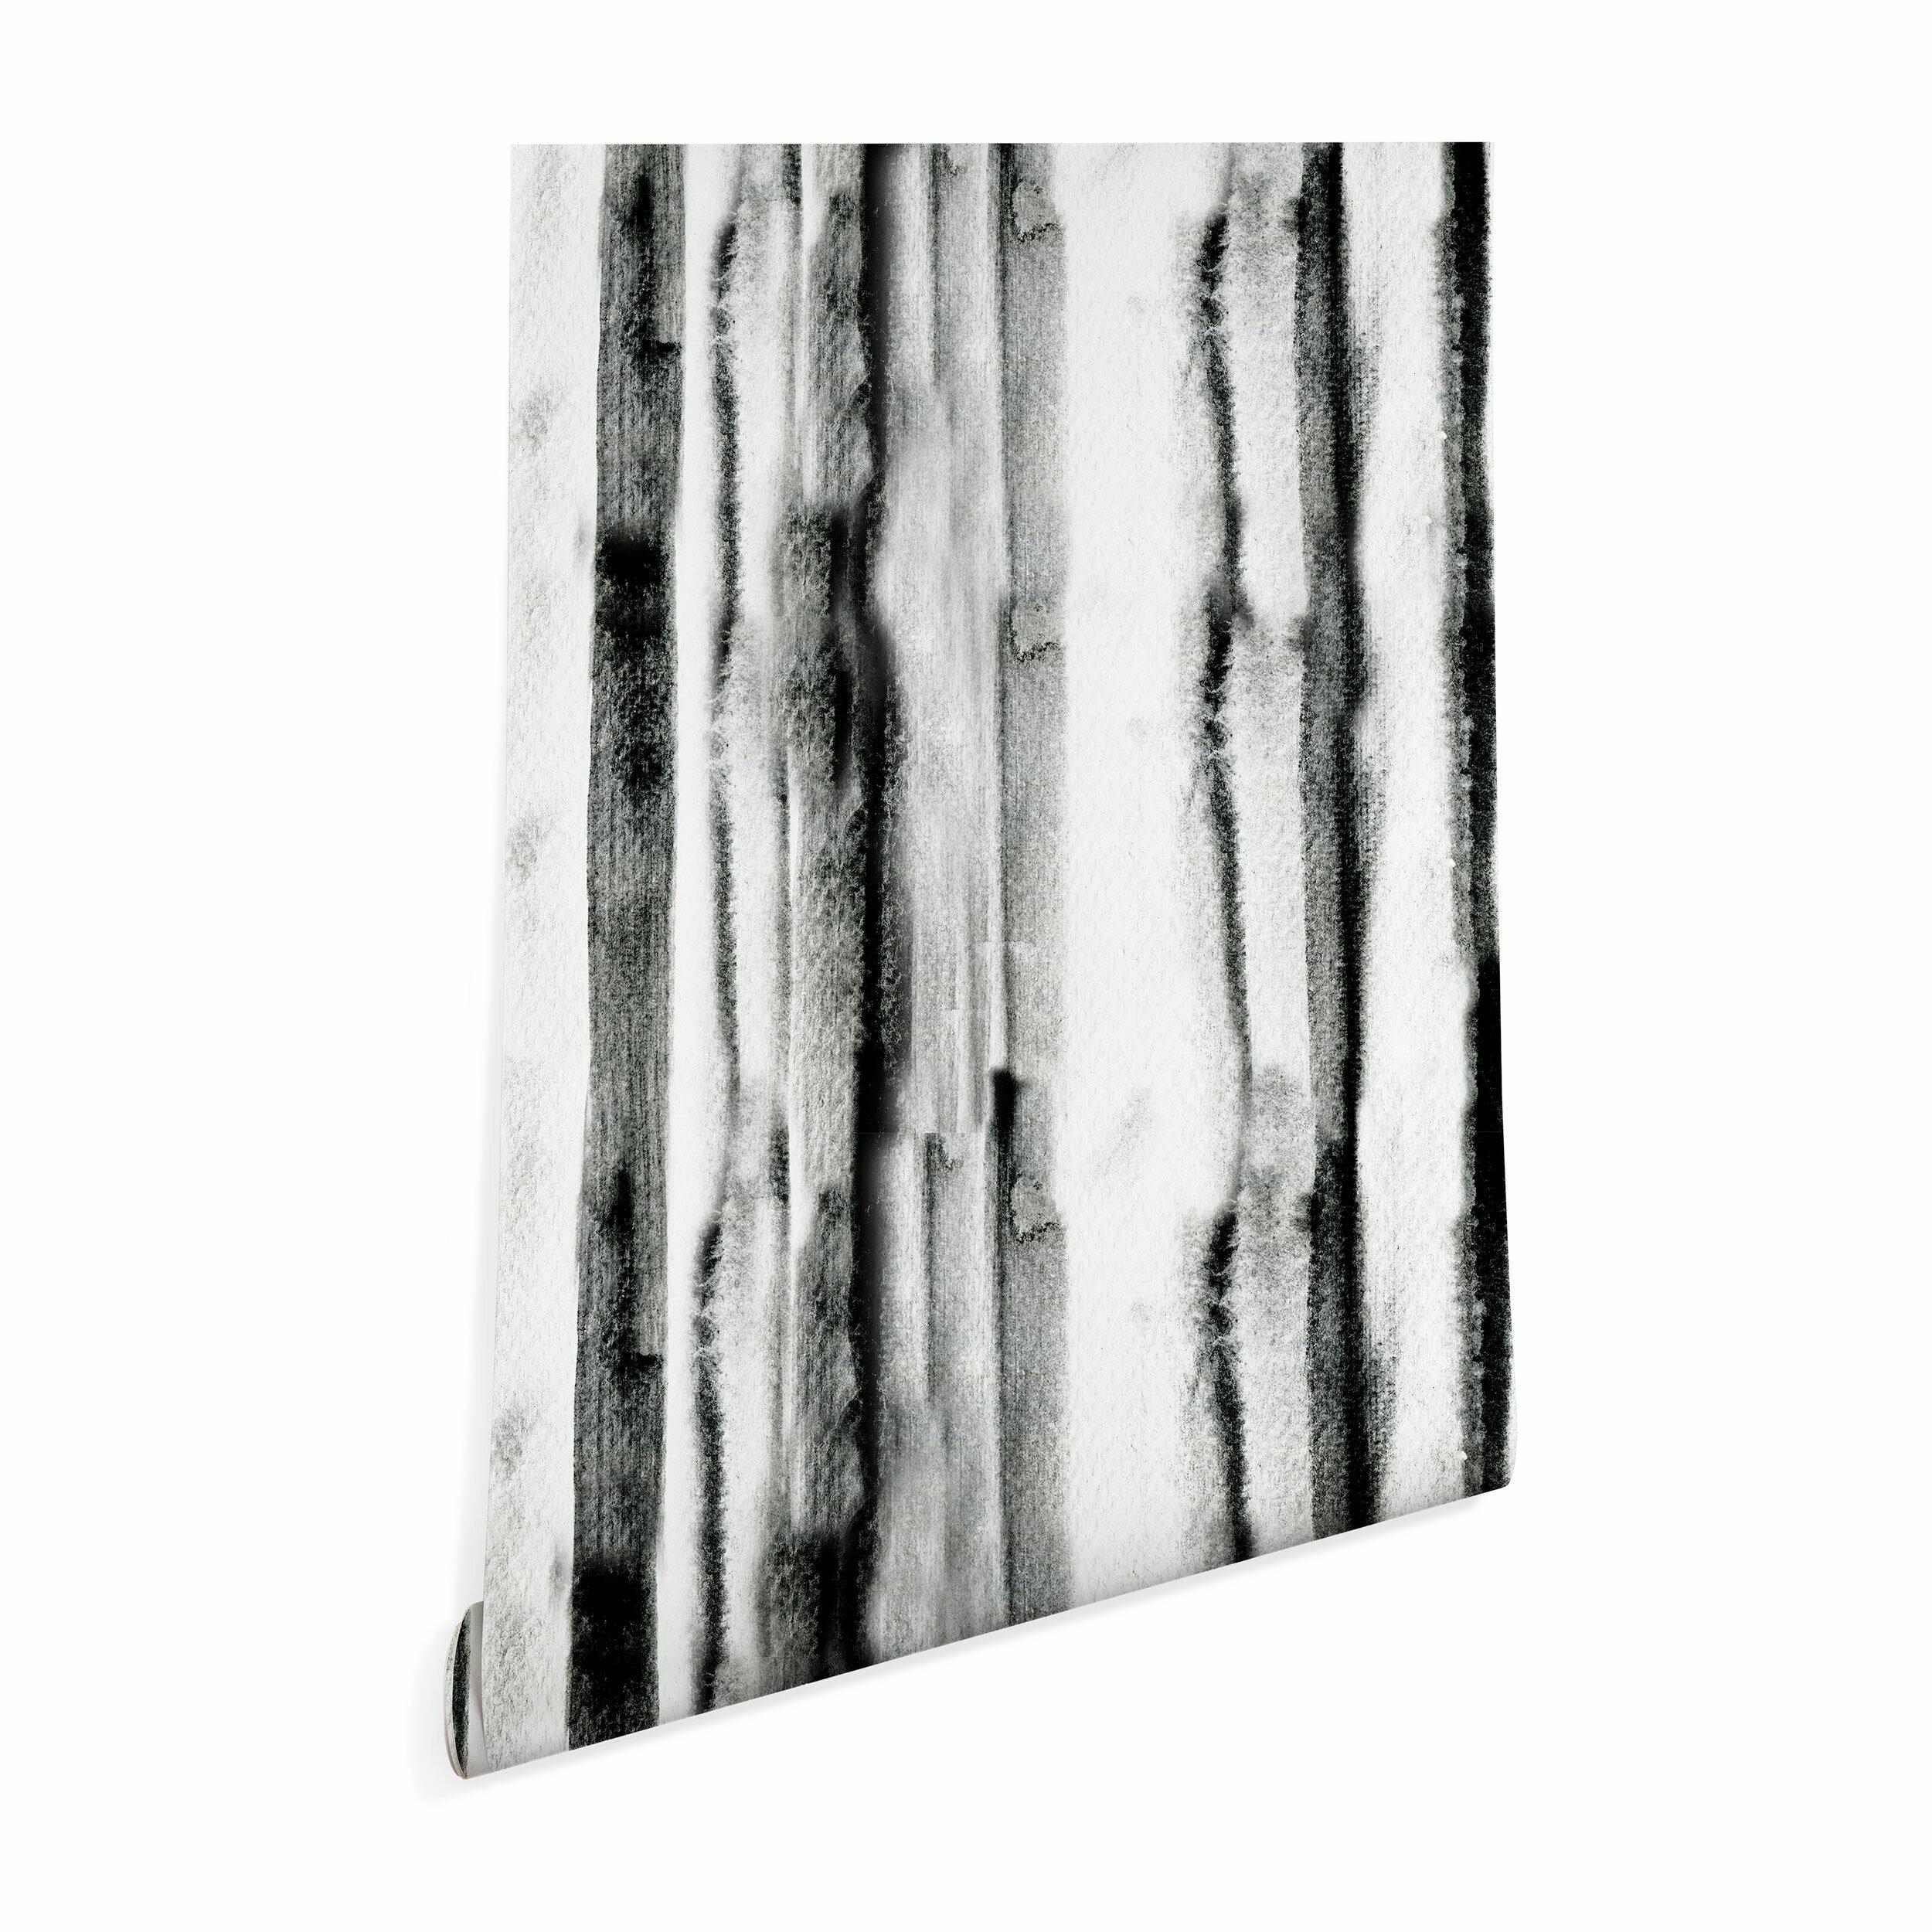 cayenablanca peel and stick wallpaper panel